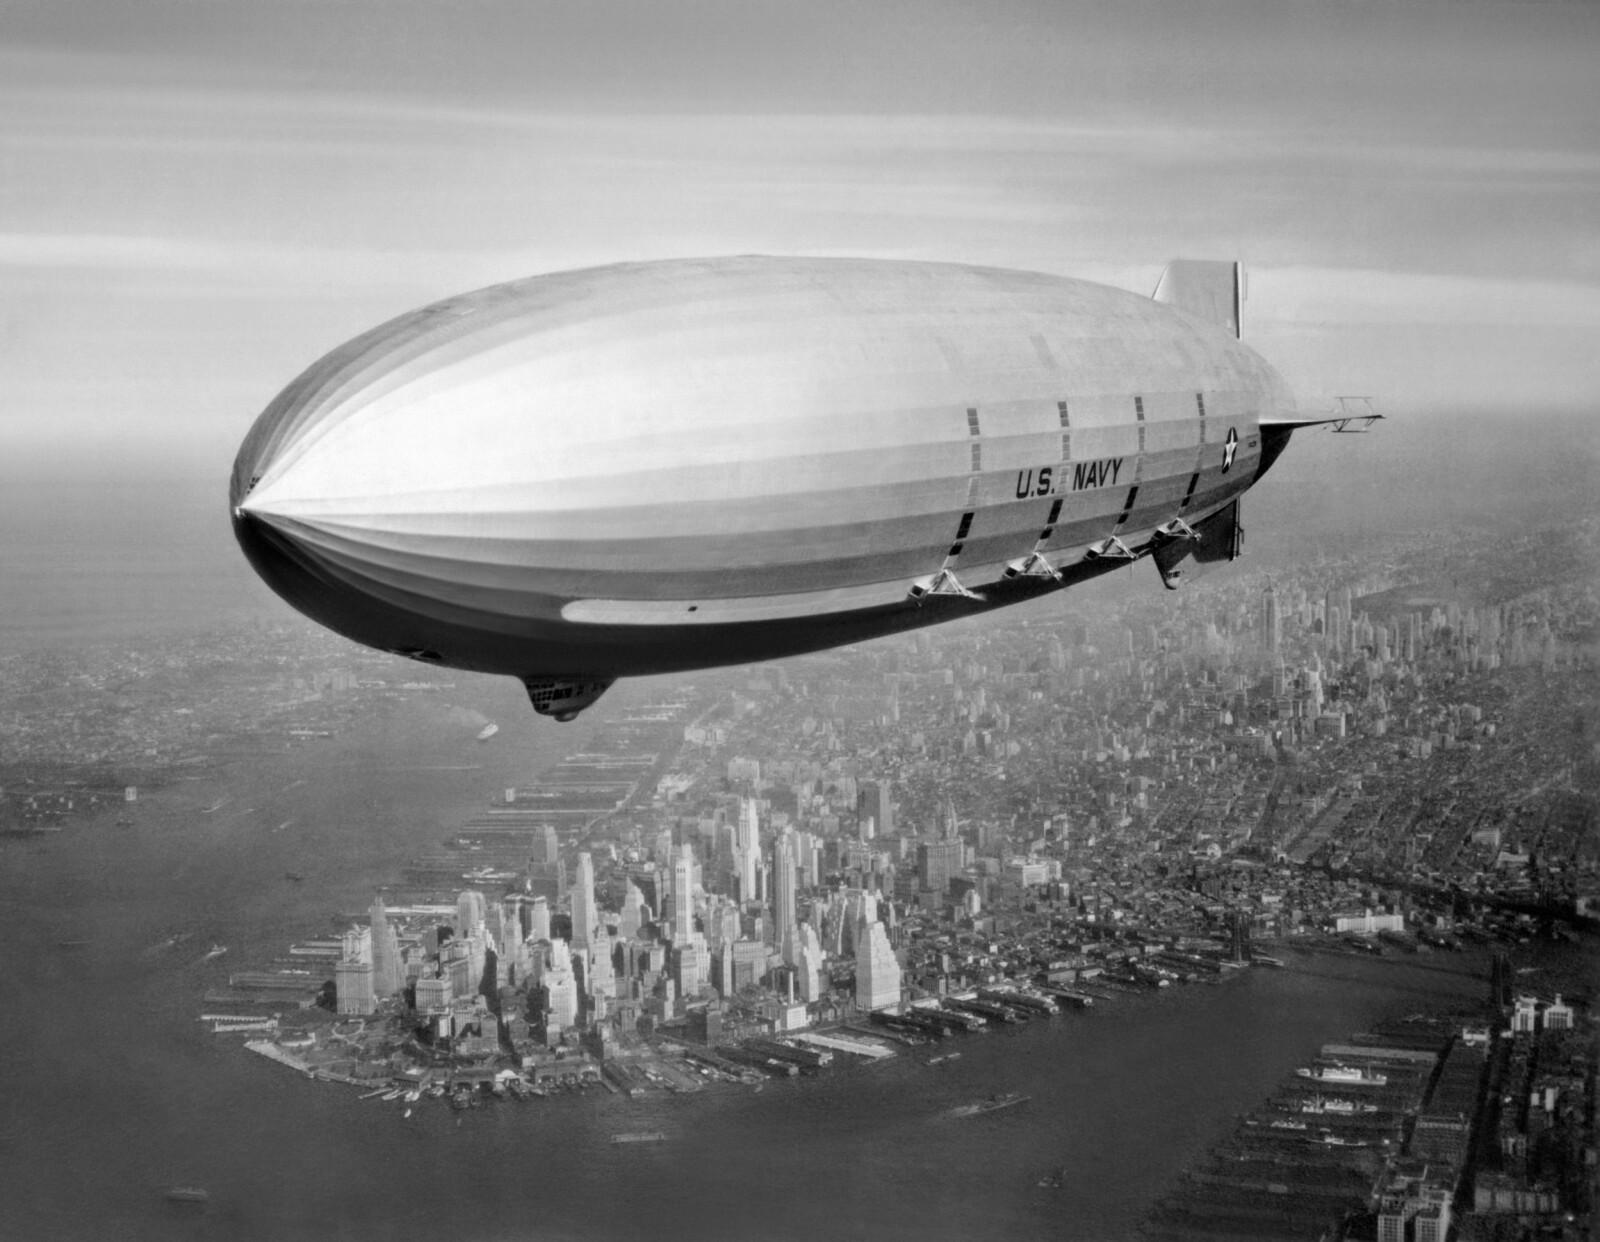 <b><SPAN CLASS=BOLD><STRONG>FLYVENDE HANGARSKIP:</b></strong></span>«Macon» i luften over New York. Heller ikke amerikanernes forsøk med luftskip på 30-tallet var vellykket. Vi husker alle hvordan det gikk med tyskernes forsøk, som endte med Hindenburg-katastrofen.